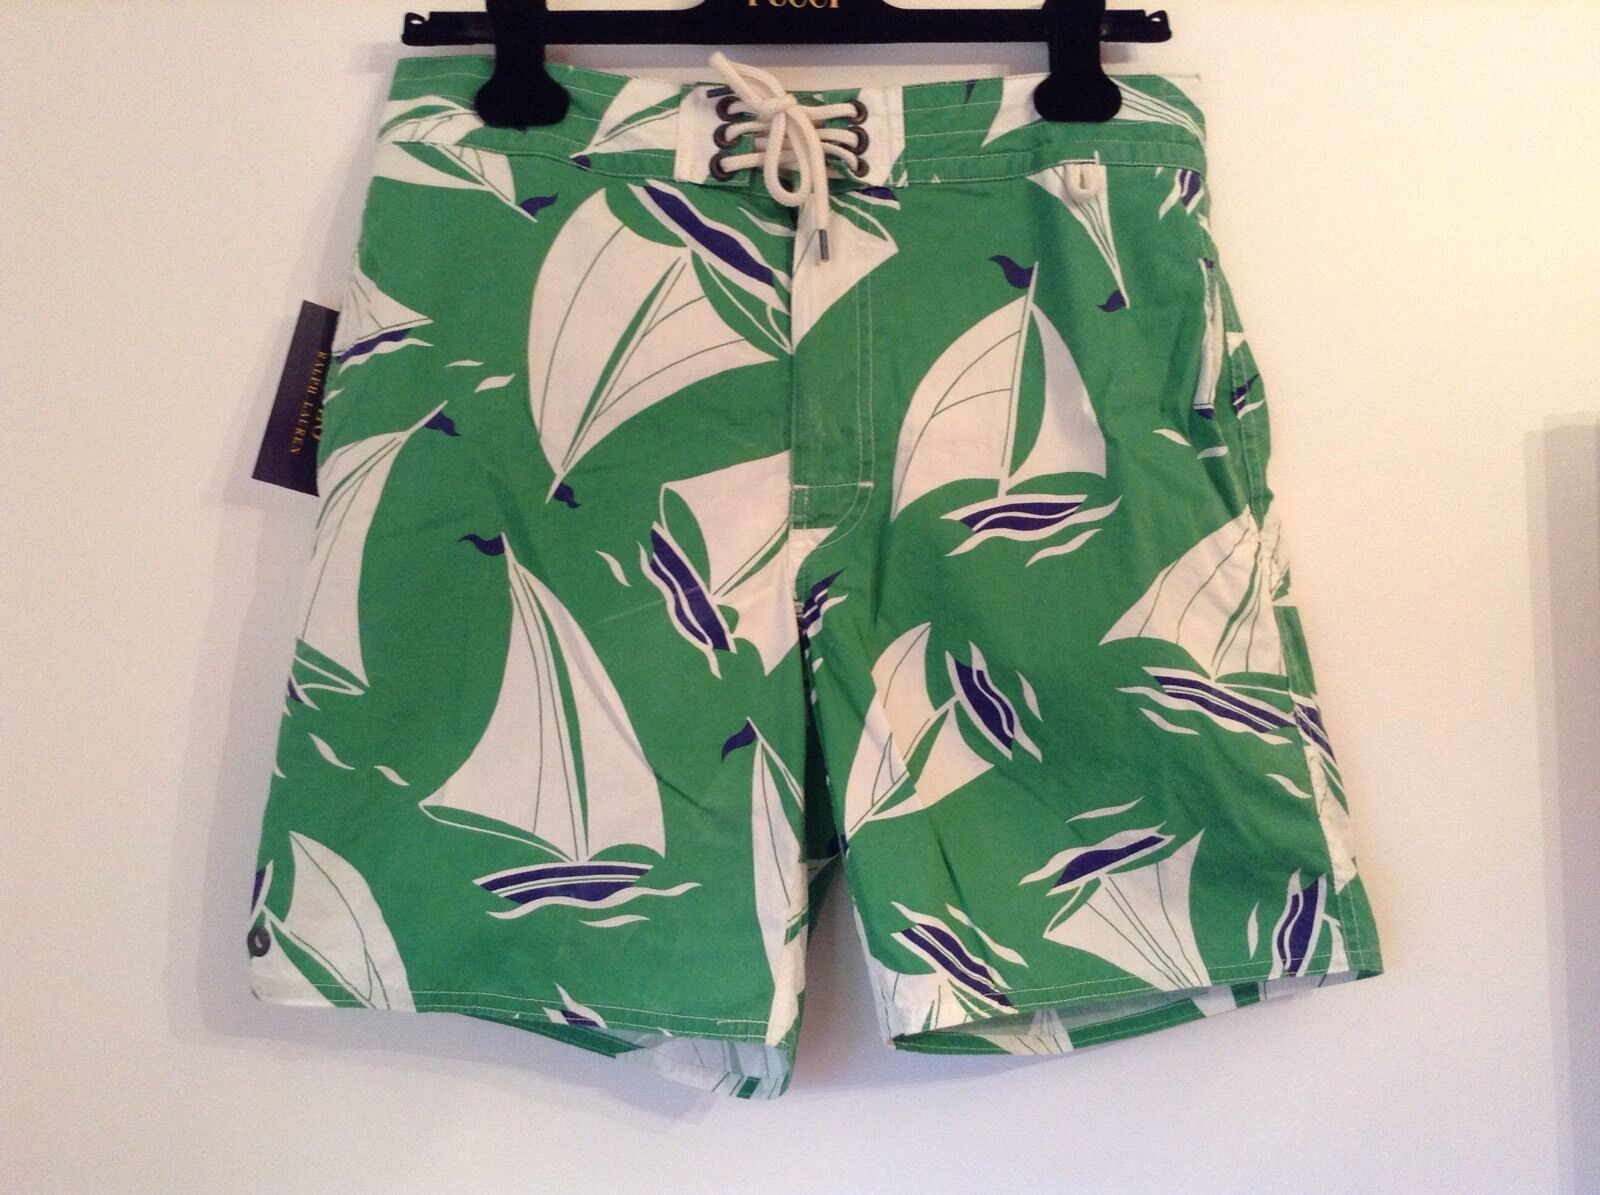 BNWT 100% Auth POLO RALPH LAUREN Mens PALM ISLAND Shorts, Swim Trunks.